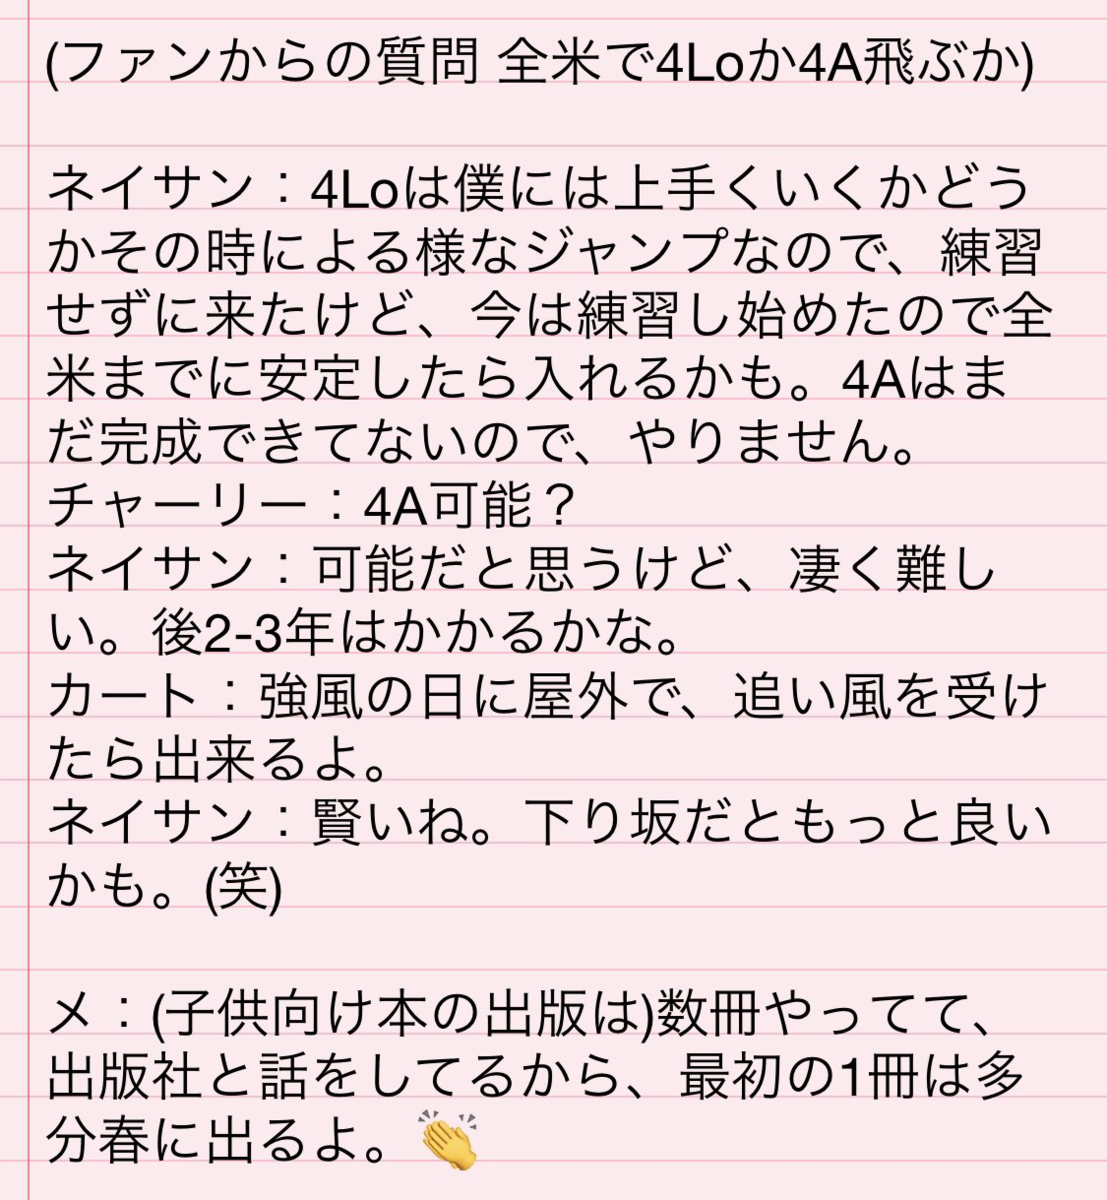 f:id:marosakura:20201231032336p:plain